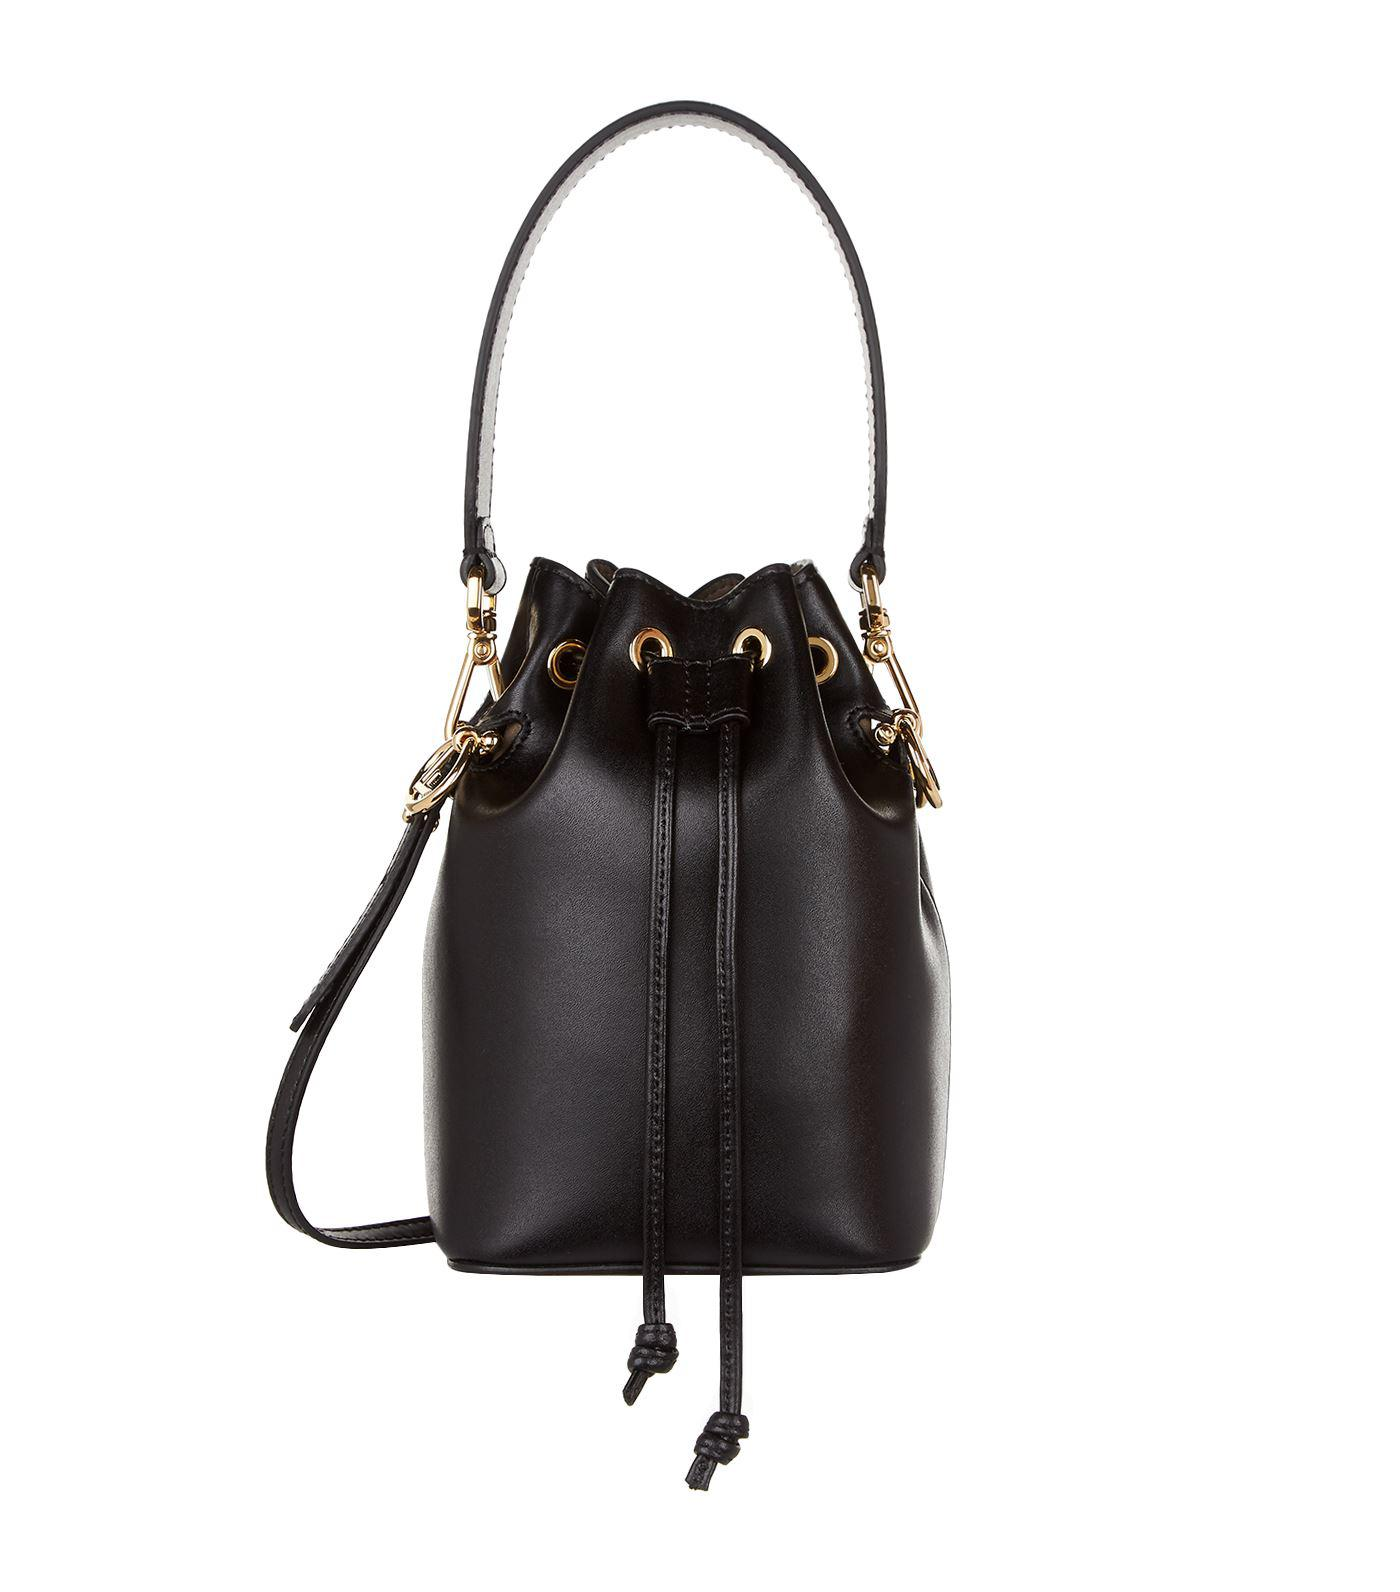 ... sweden lyst fendi mini leather mon tresor bucket bag white one size in  b2246 07119 c2023b6221